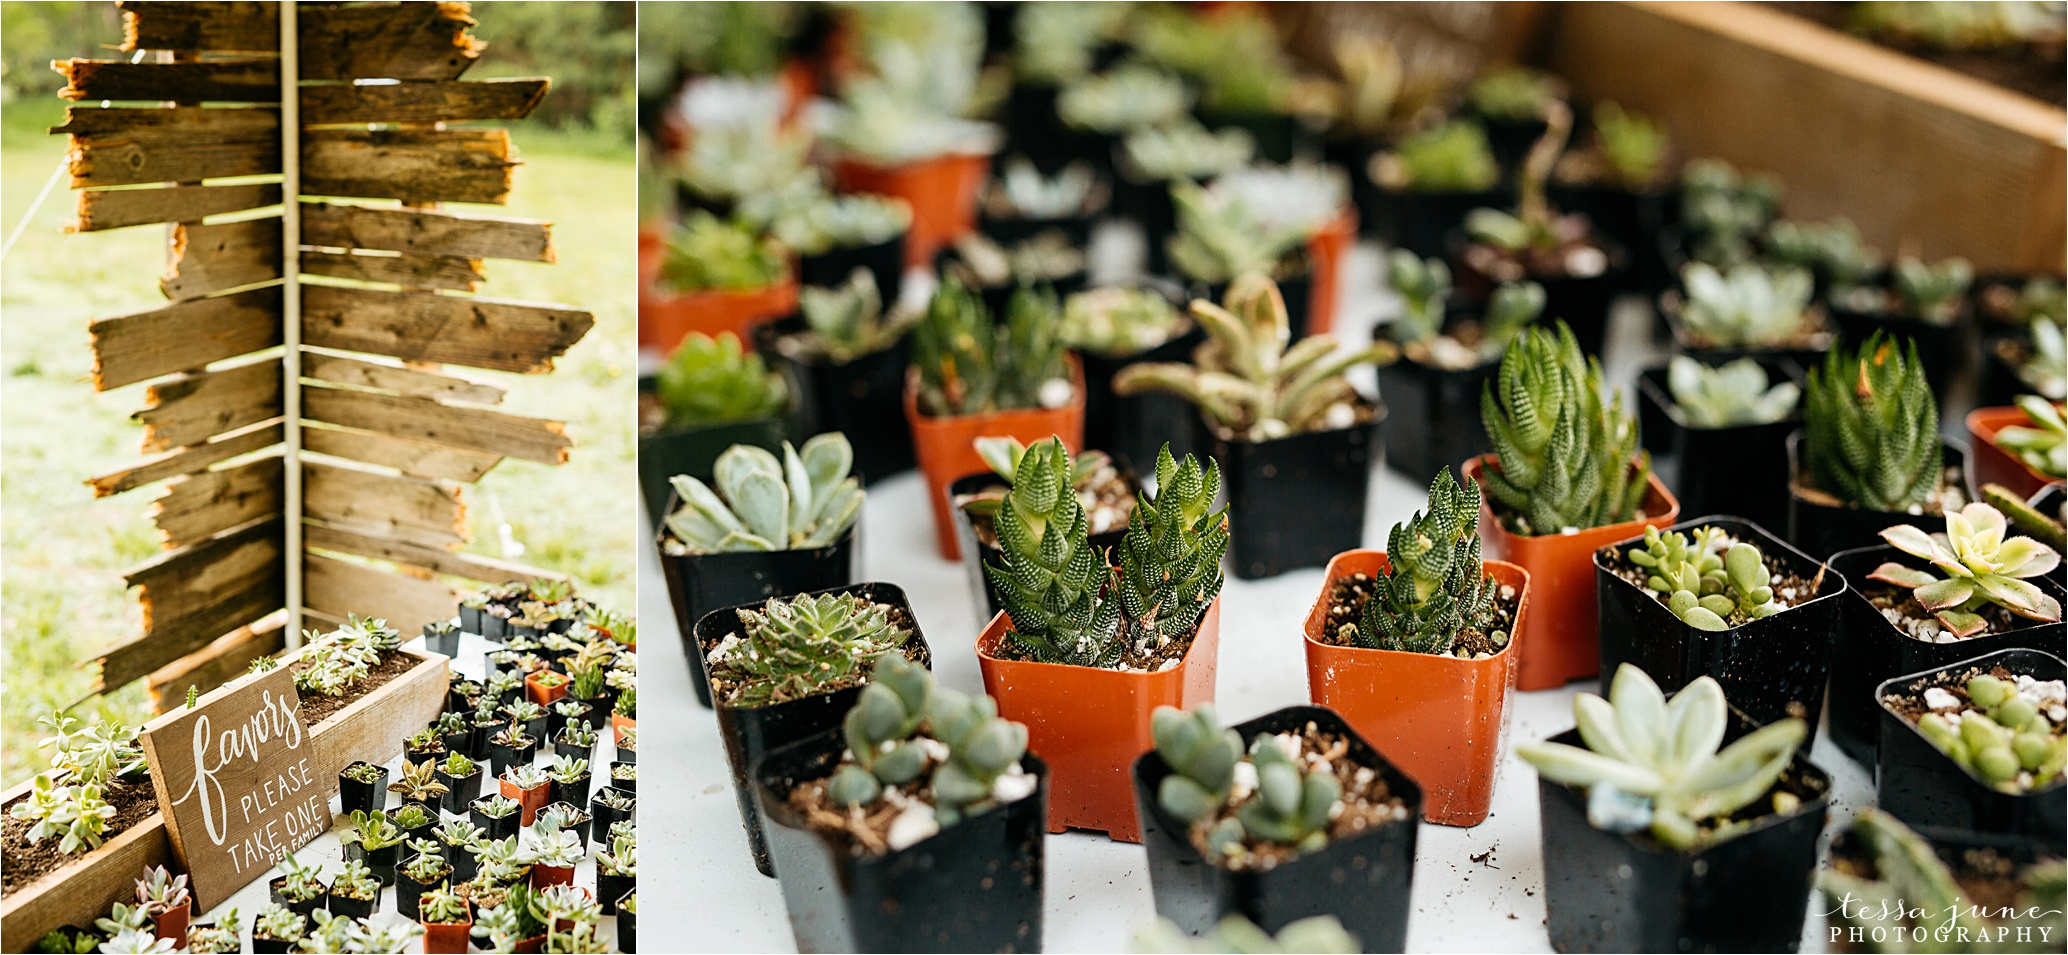 bohemian-forest-wedding-stillwater-minnesota-flower-crown-st-cloud-photographer-succulents-guest-party-favors